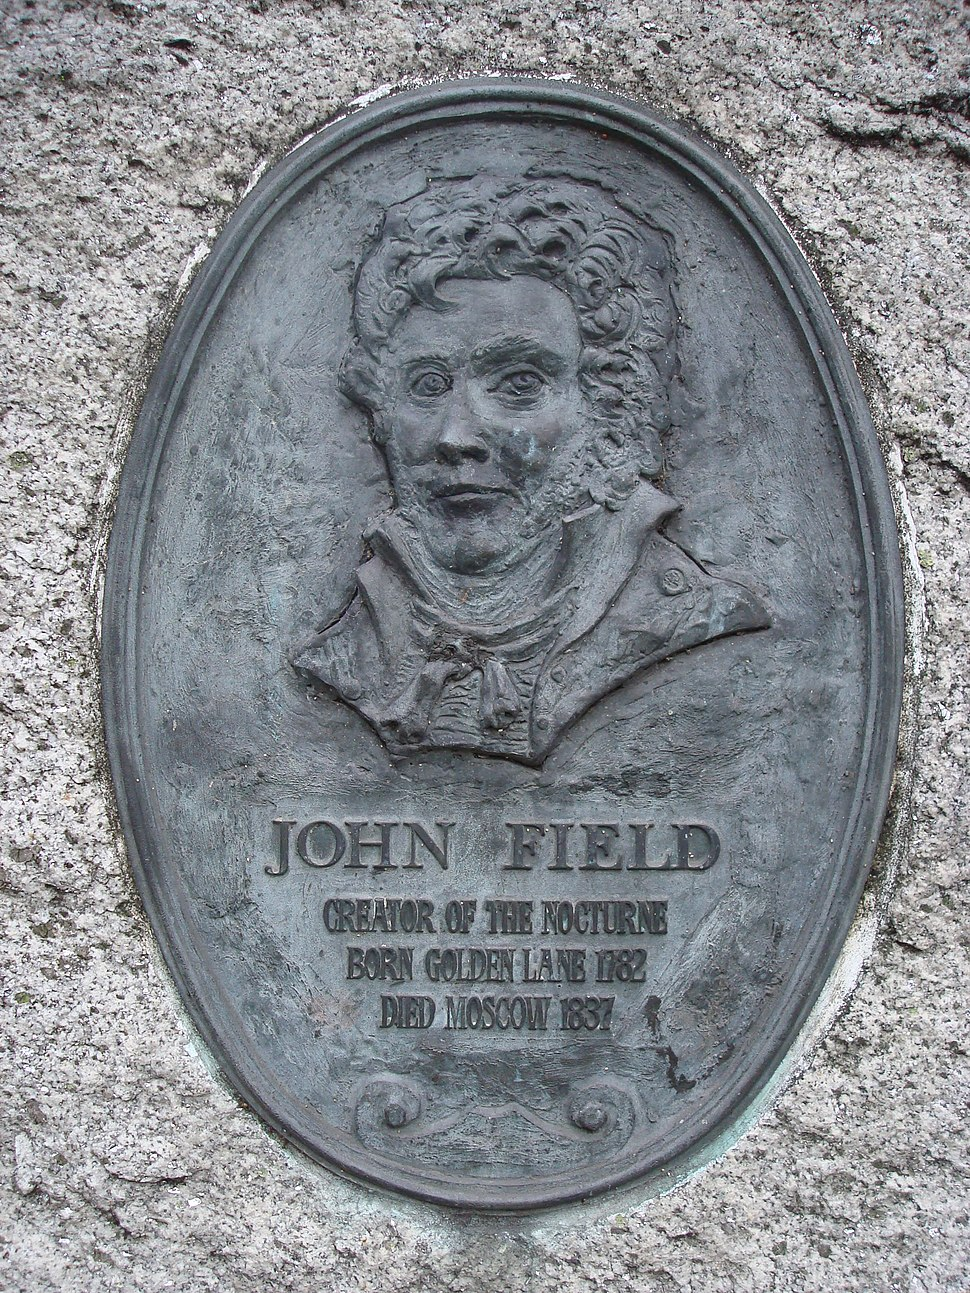 John Field Plaque, Golden Lane